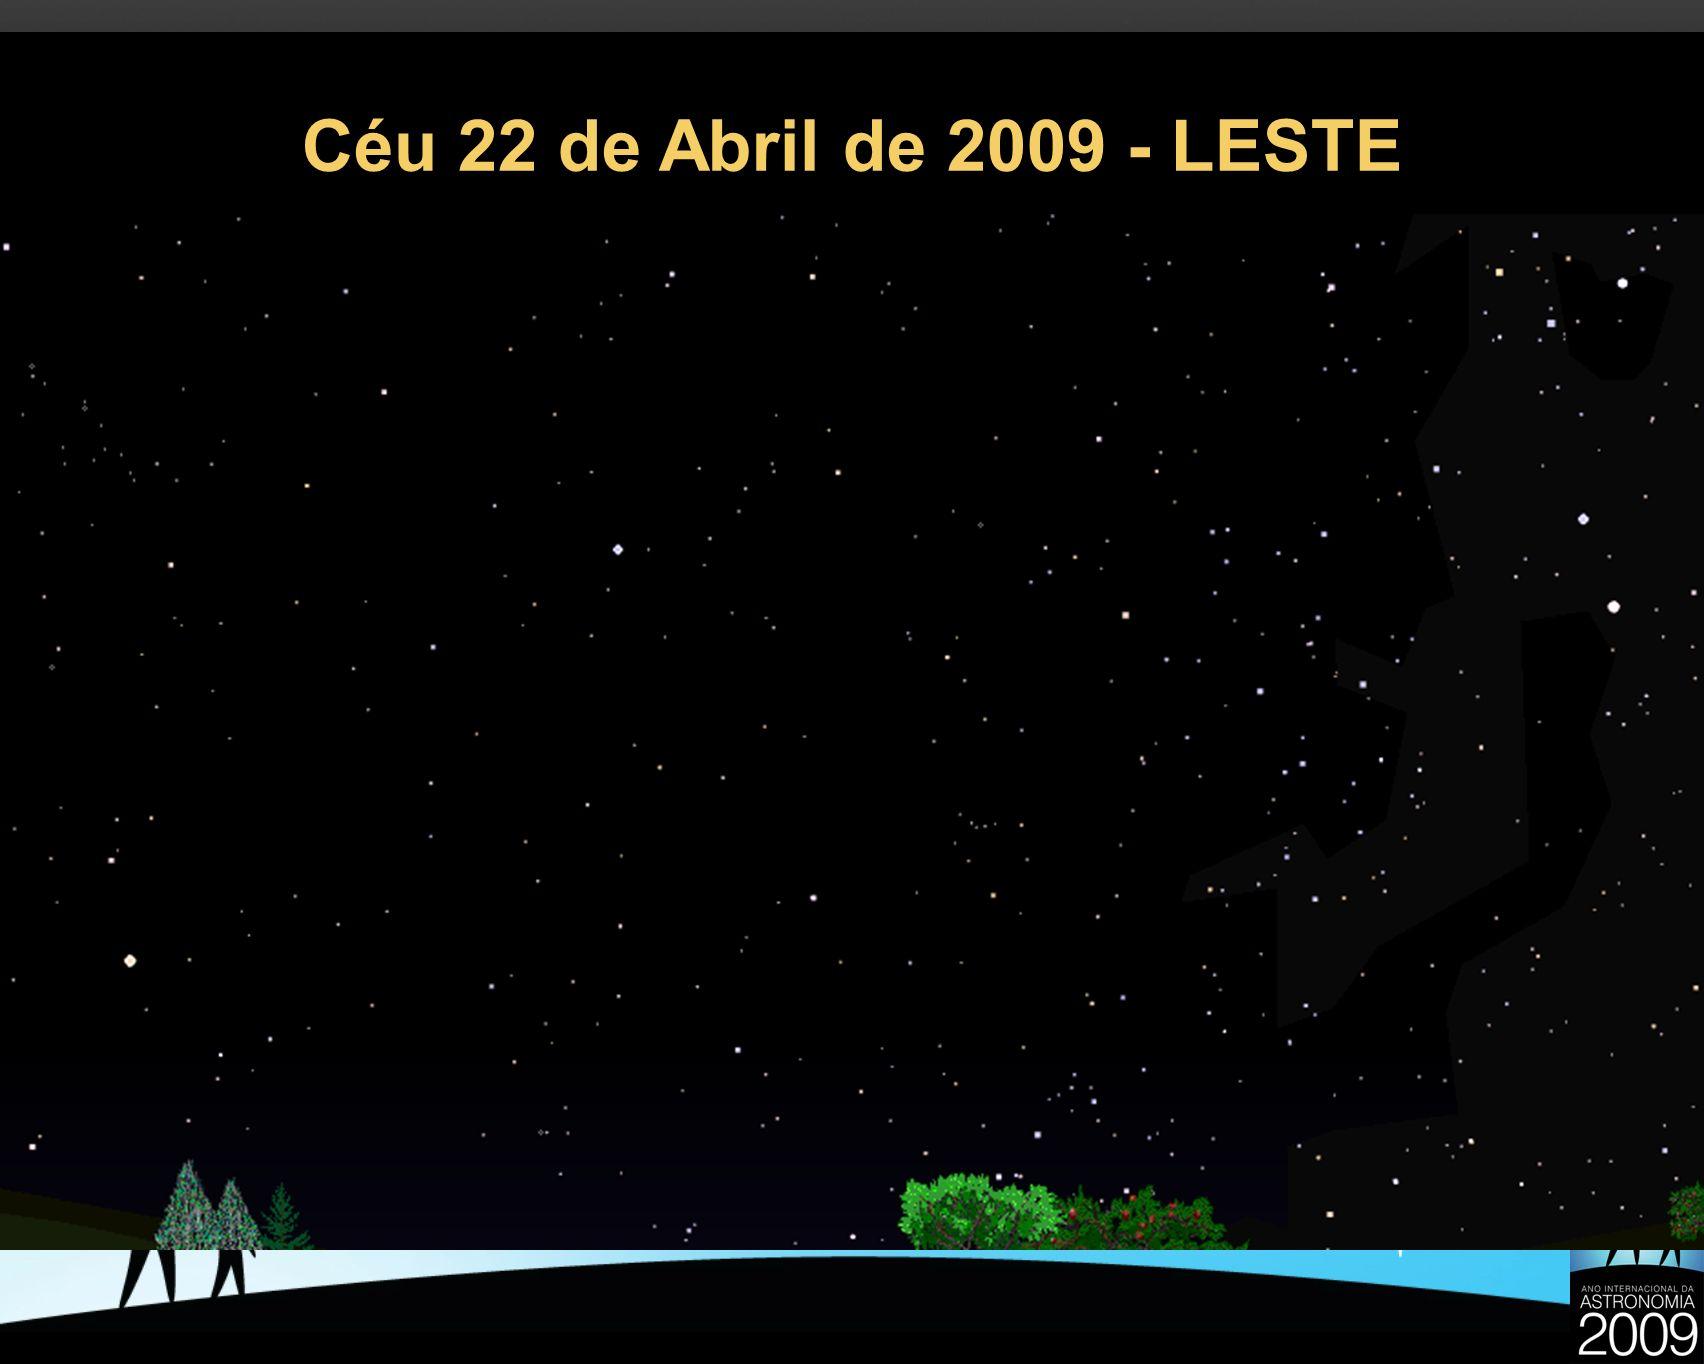 Céu 22 de Abril de 2009 - LESTE